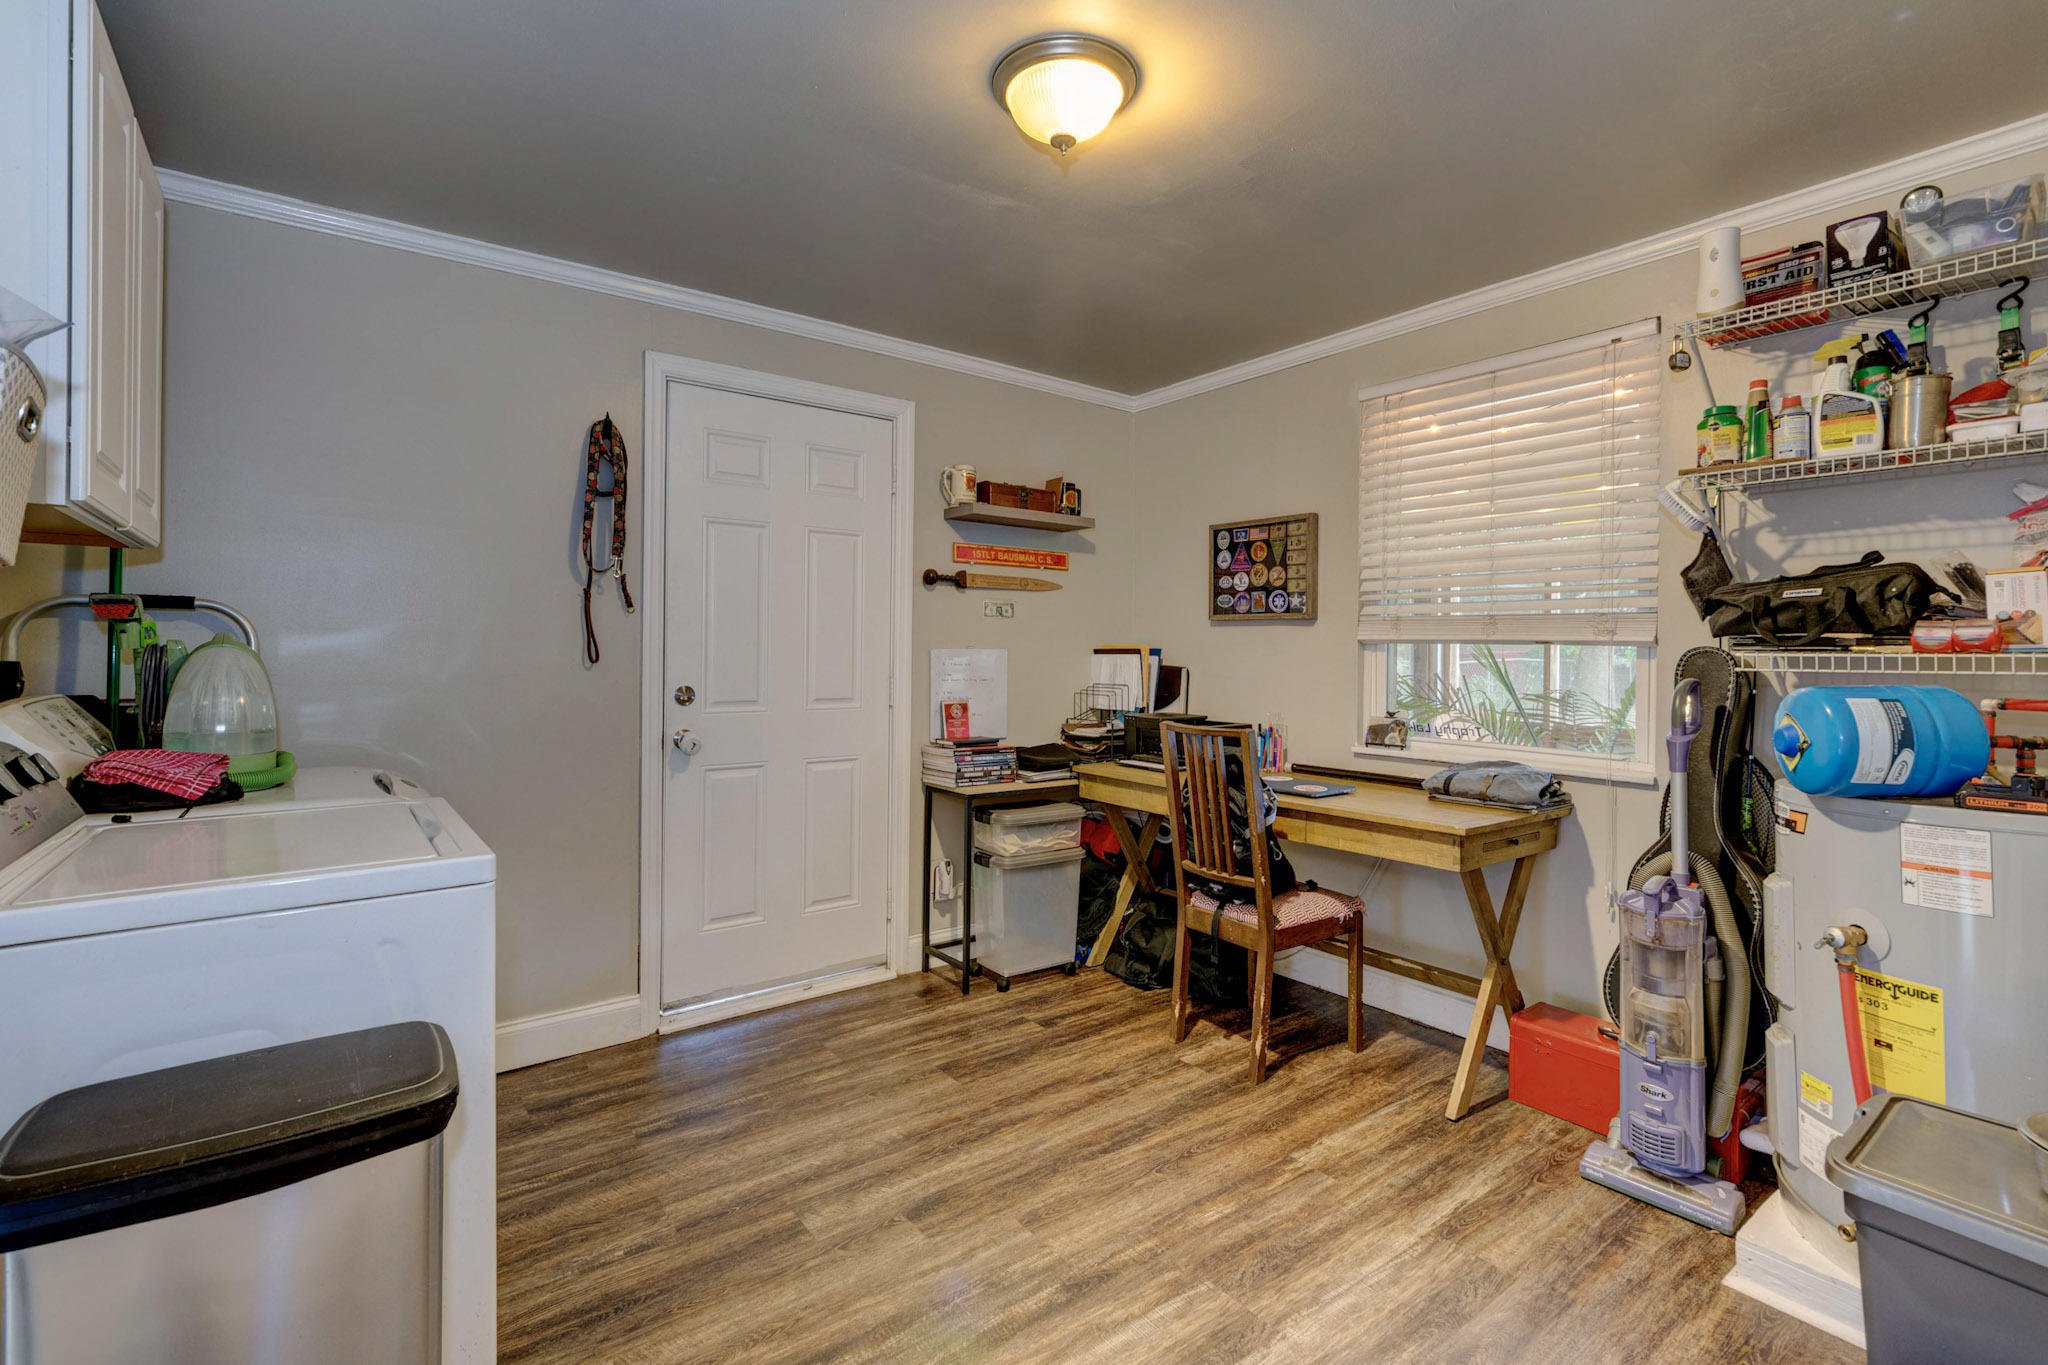 St Andrews Homes For Sale - 1808 2nd, Charleston, SC - 10